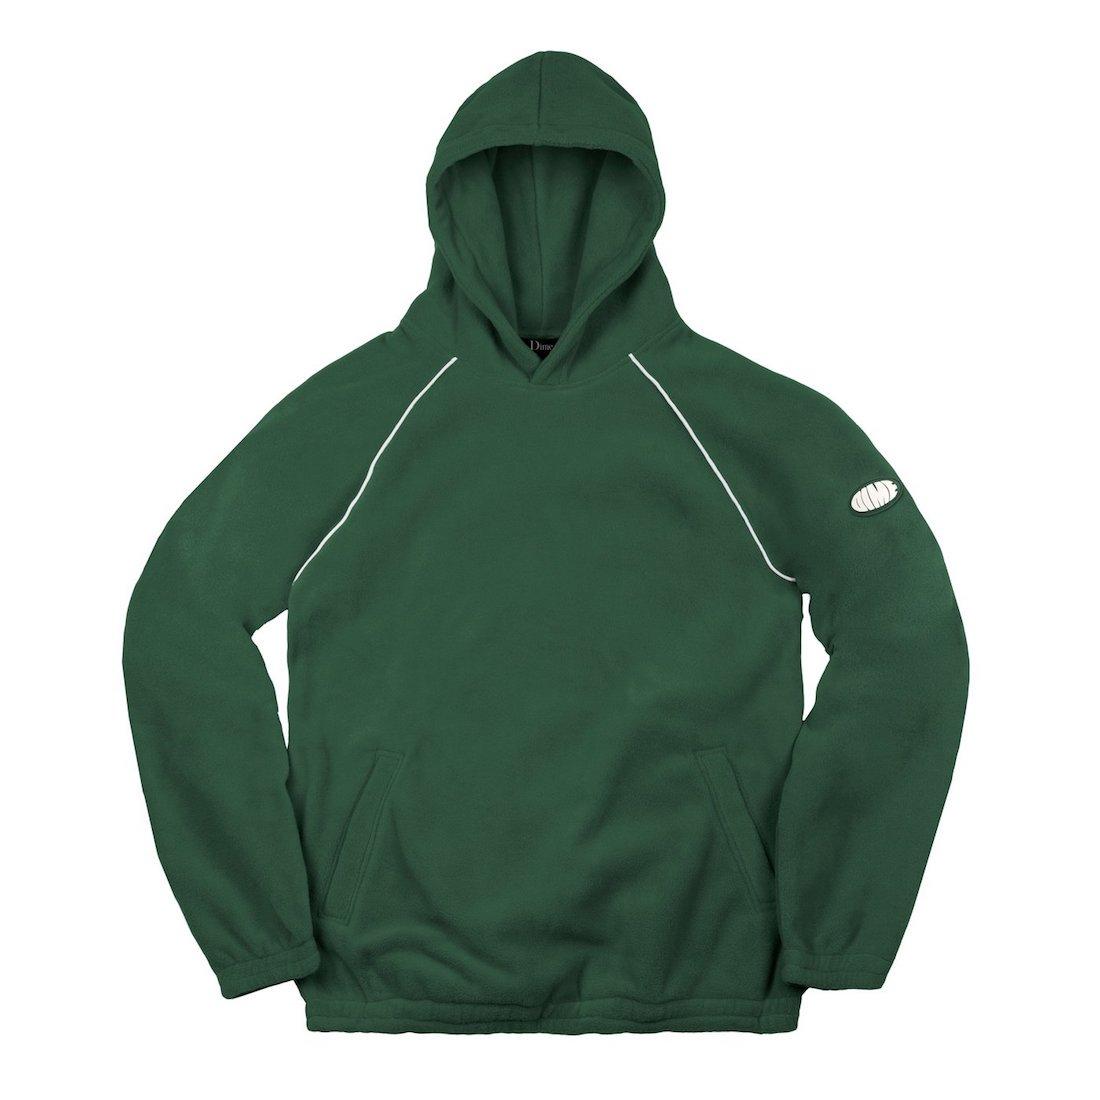 【Dime】Fleece Hoodie - Green